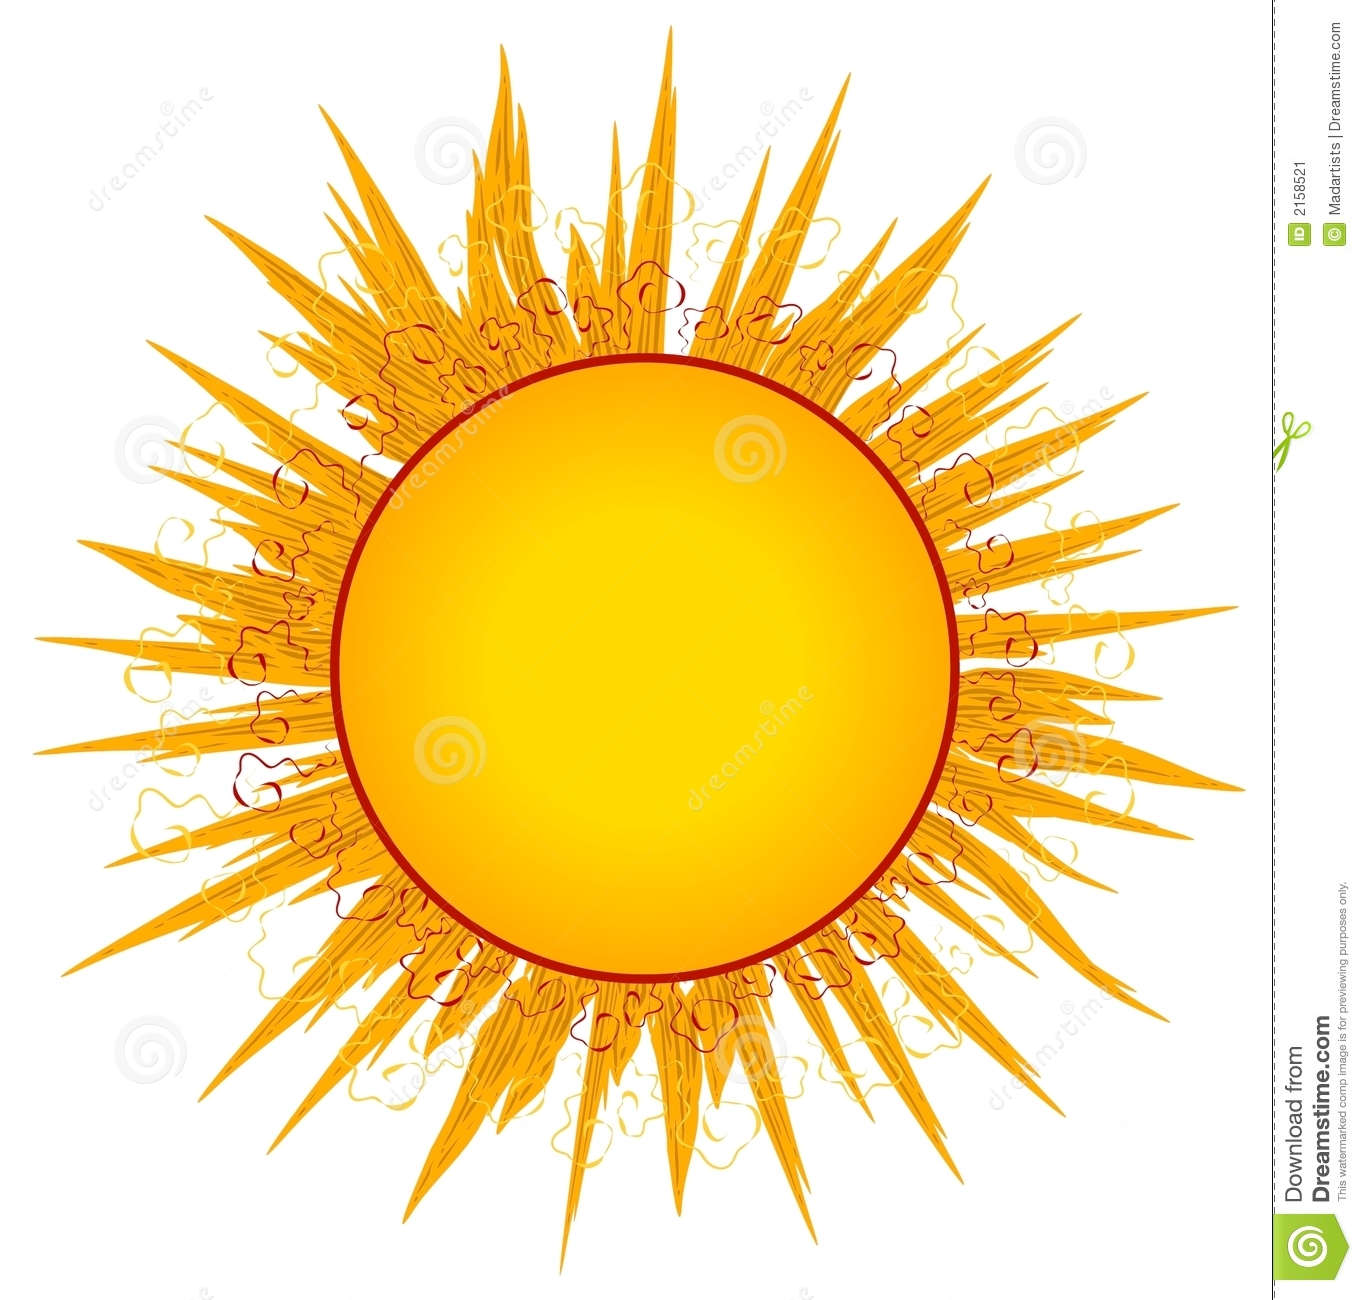 Sun Sunrays Clip Art or Logo-Sun Sunrays Clip Art or Logo-15